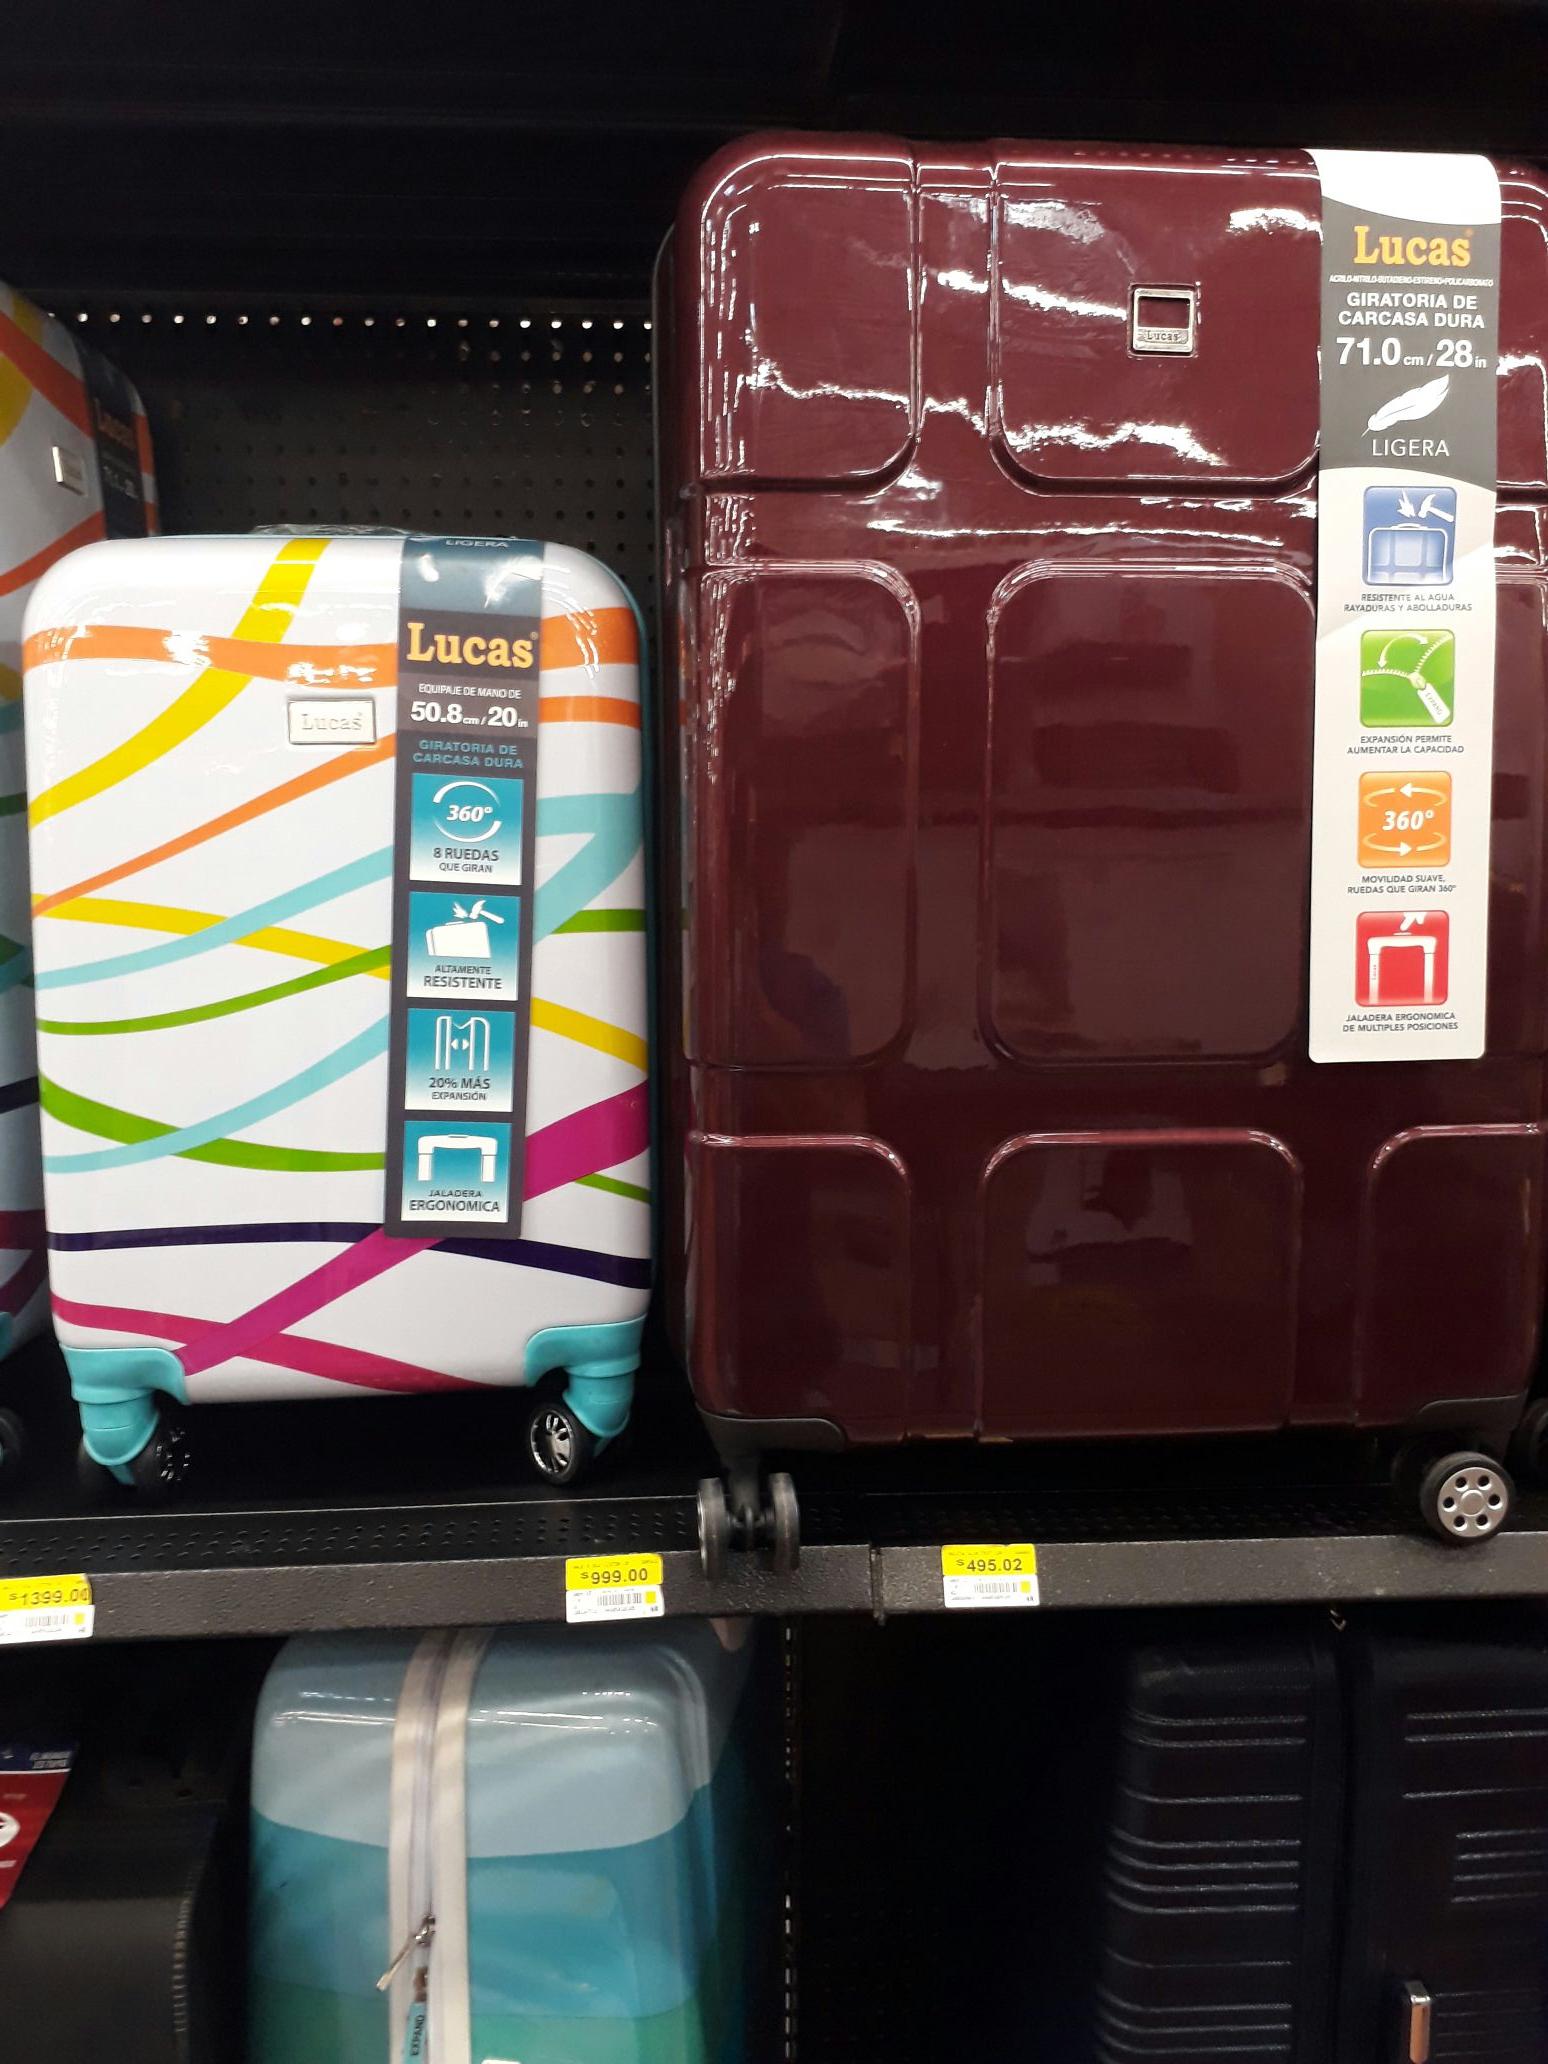 Walmart: Maleta expandible Lucas de $1,599 a $148.01 + promonovela.